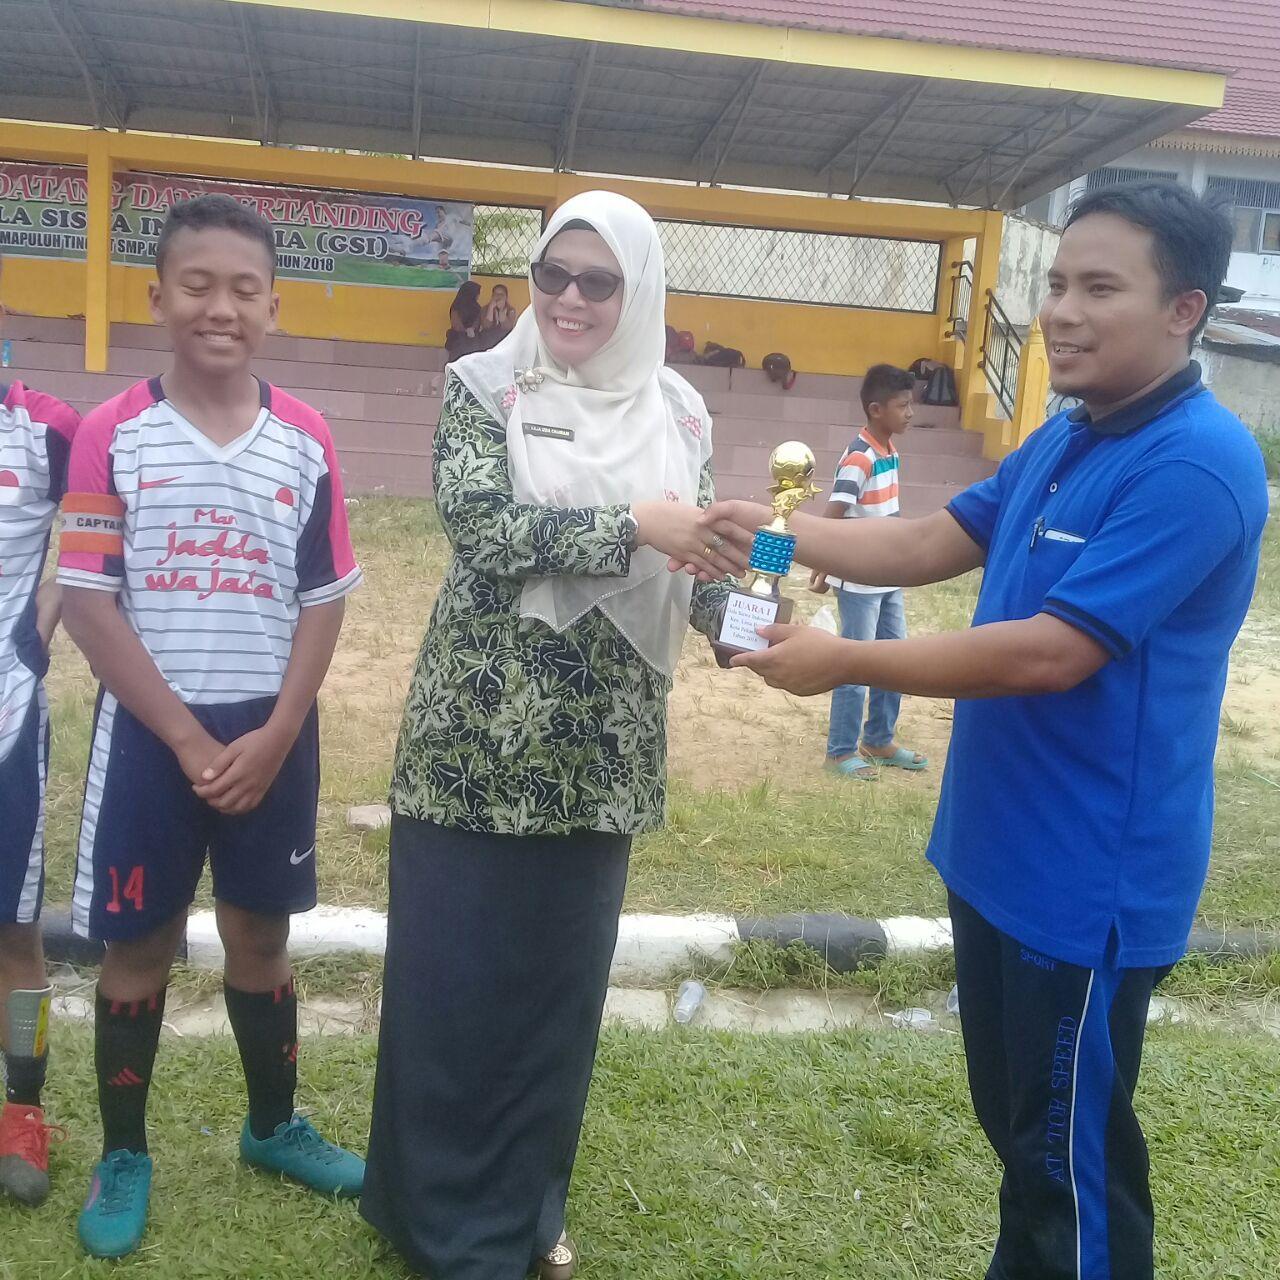 Juara I Gala Siswa Indonesia Kecamatan Limapuluh Pekanbaru